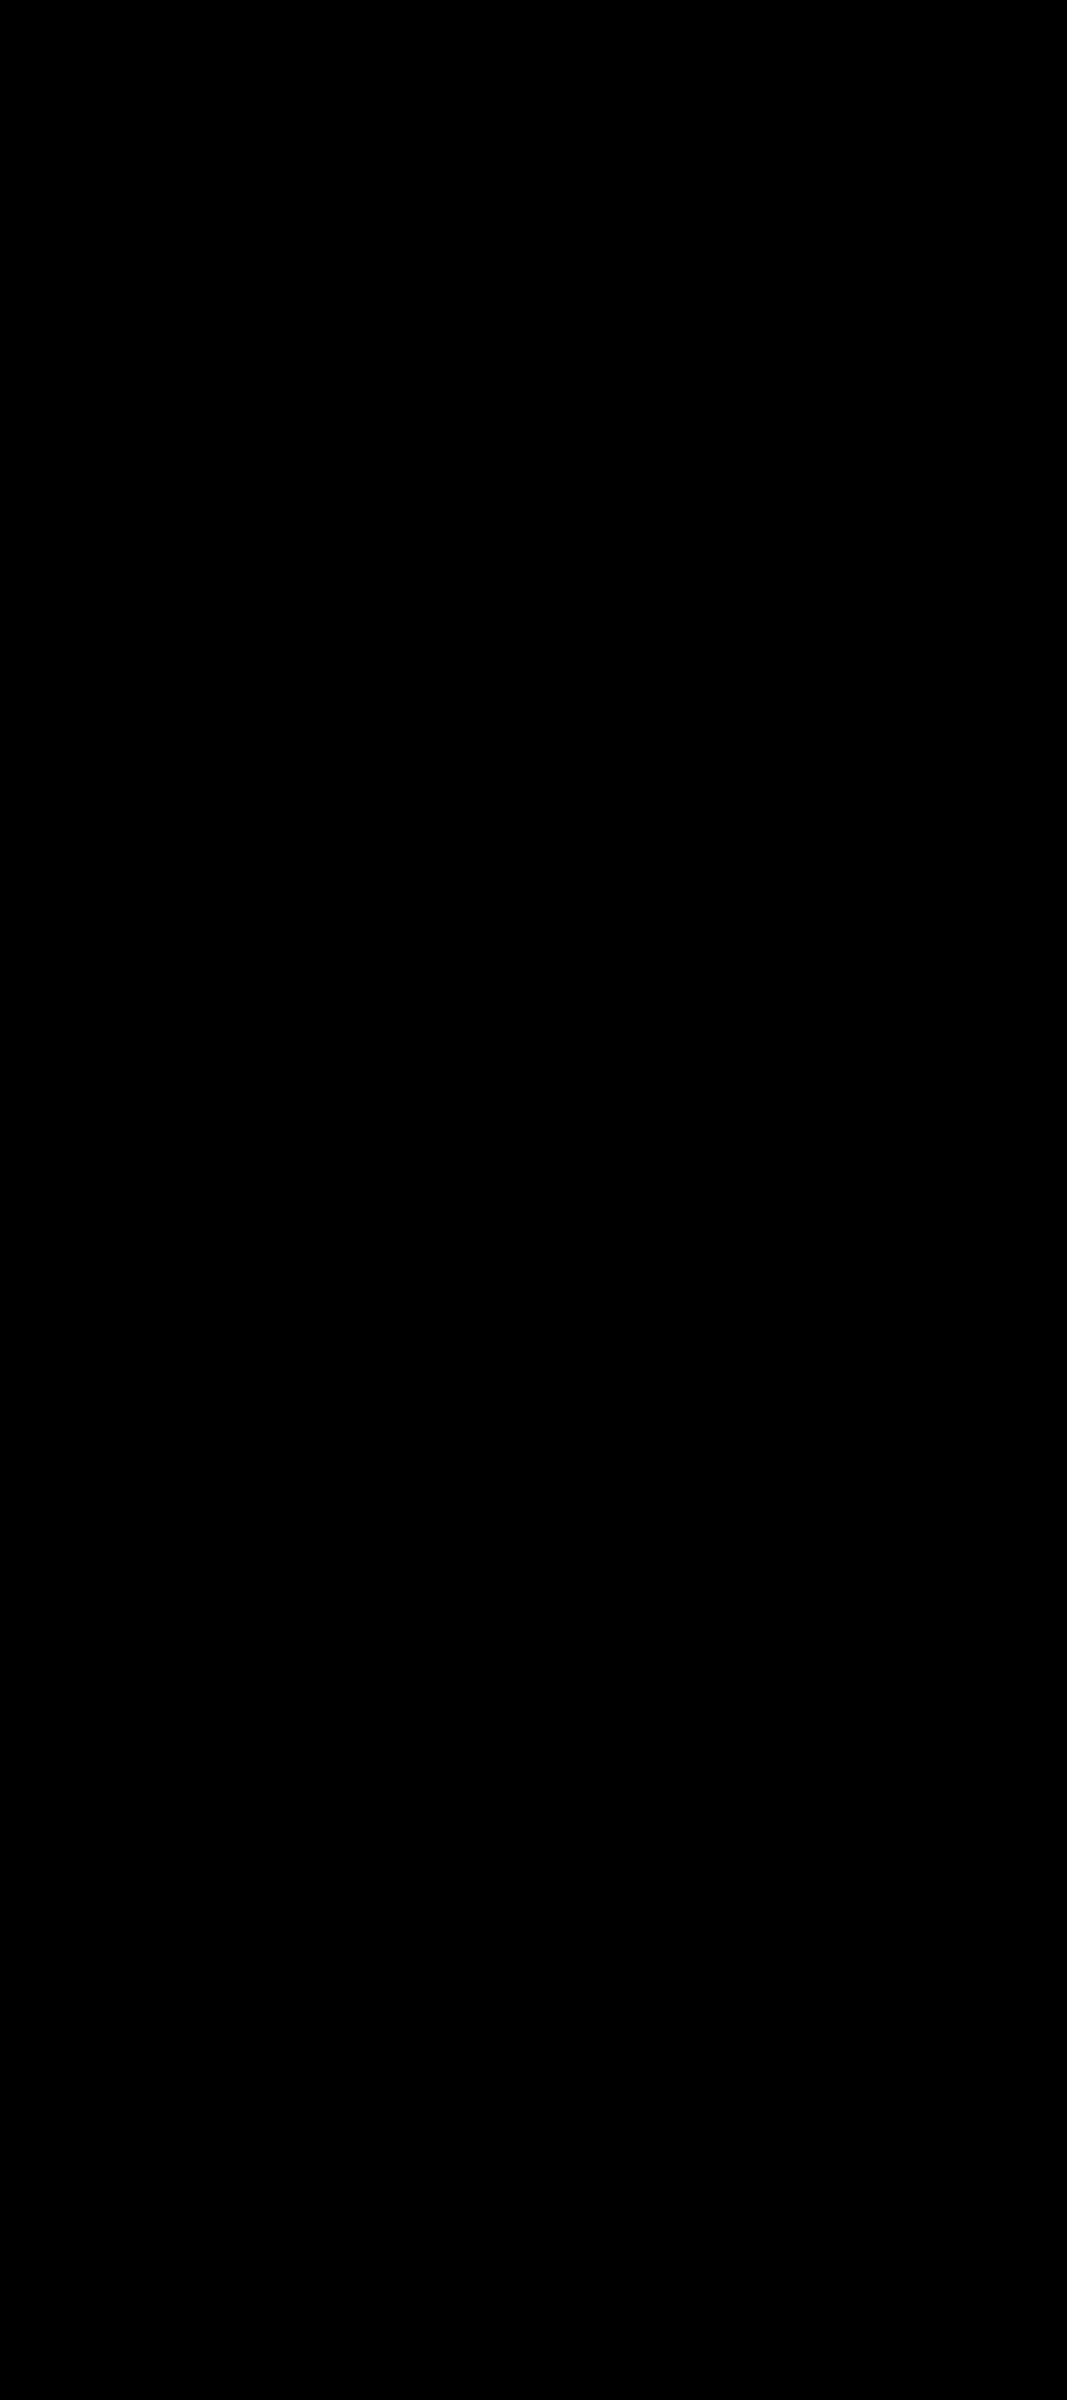 Antenna Clipart